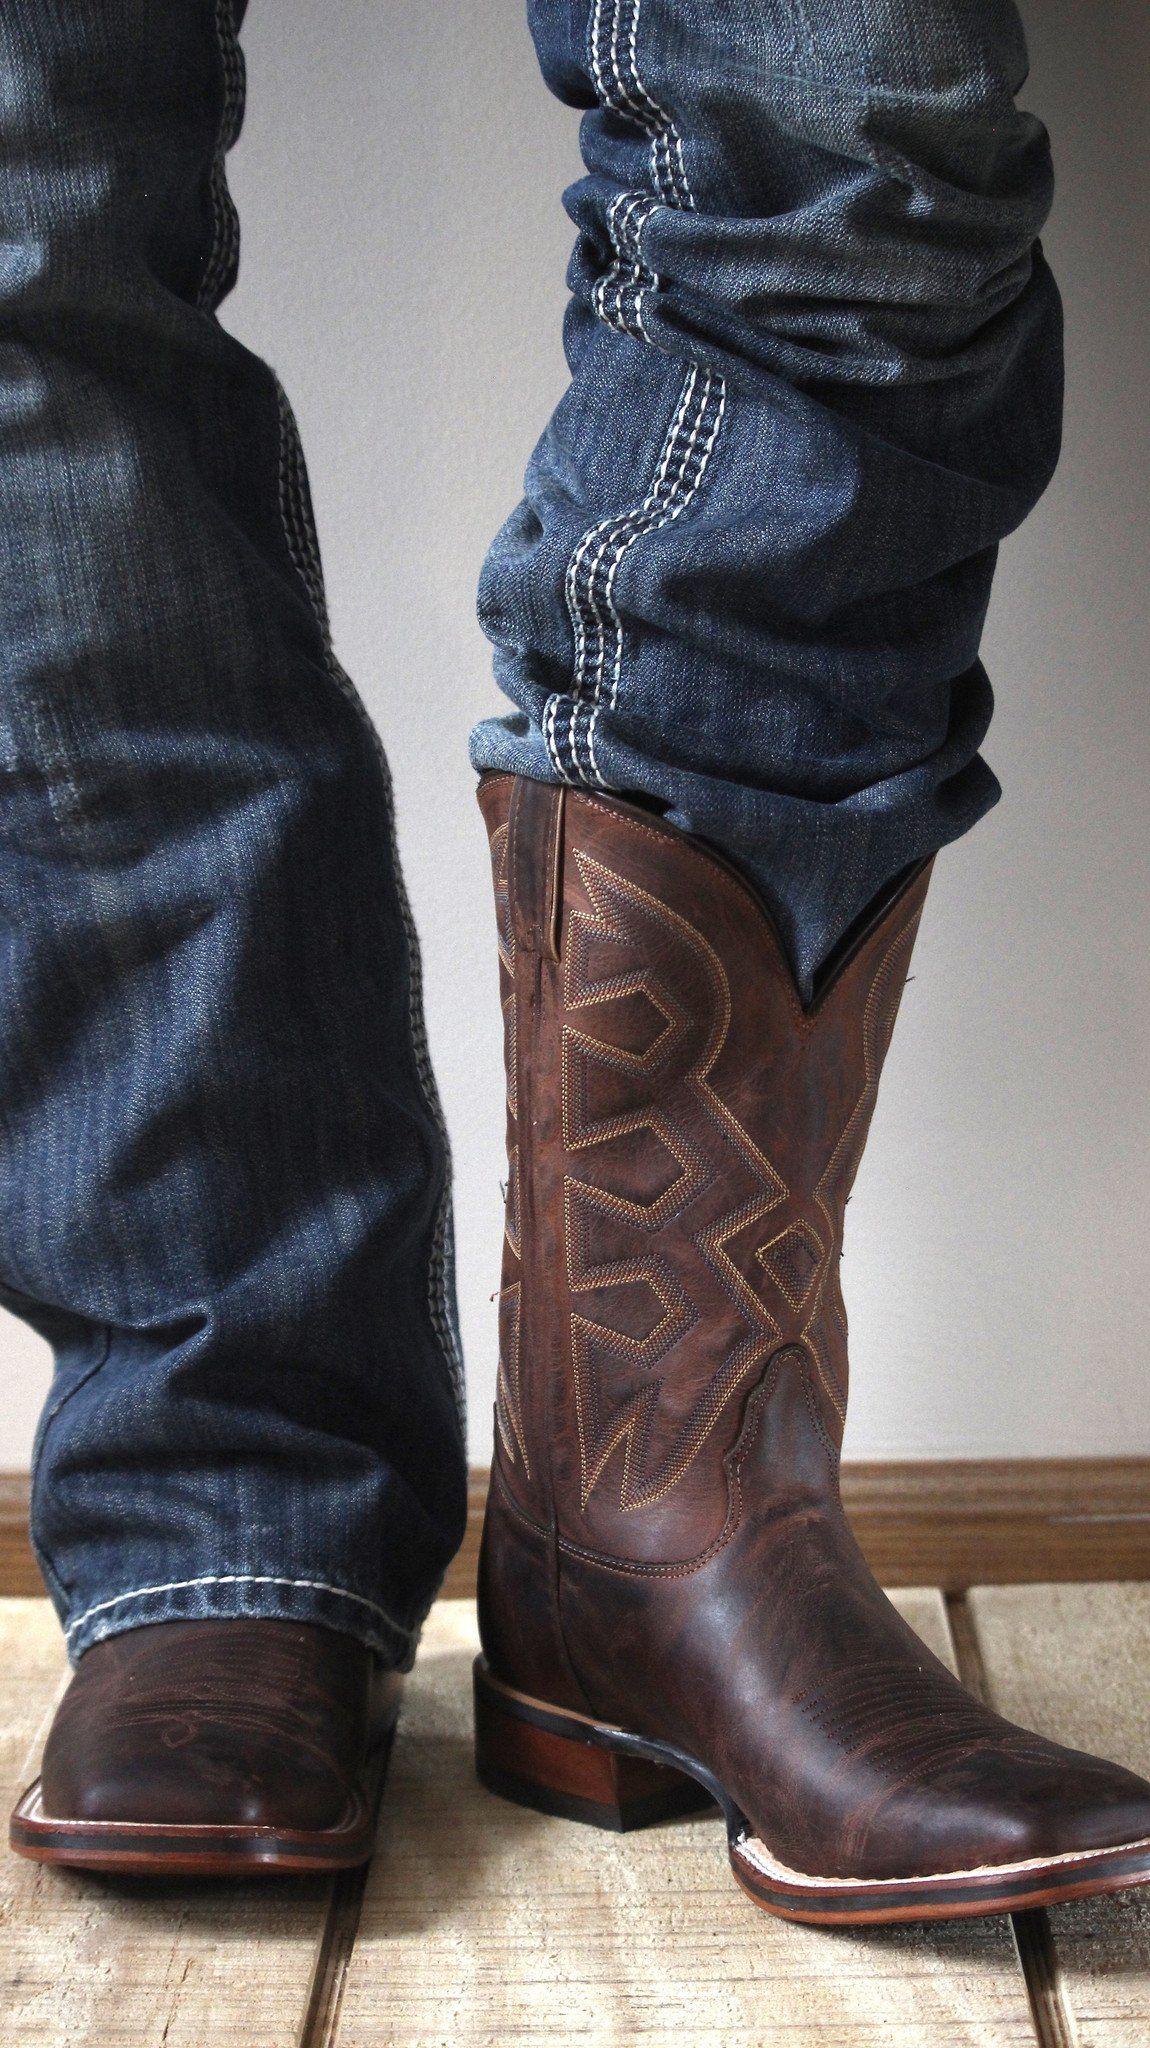 0e1acb813e9 Nocona Men's Cognac Zulu Let's Rodeo® Cowboy Boot MD5301 | Much ...